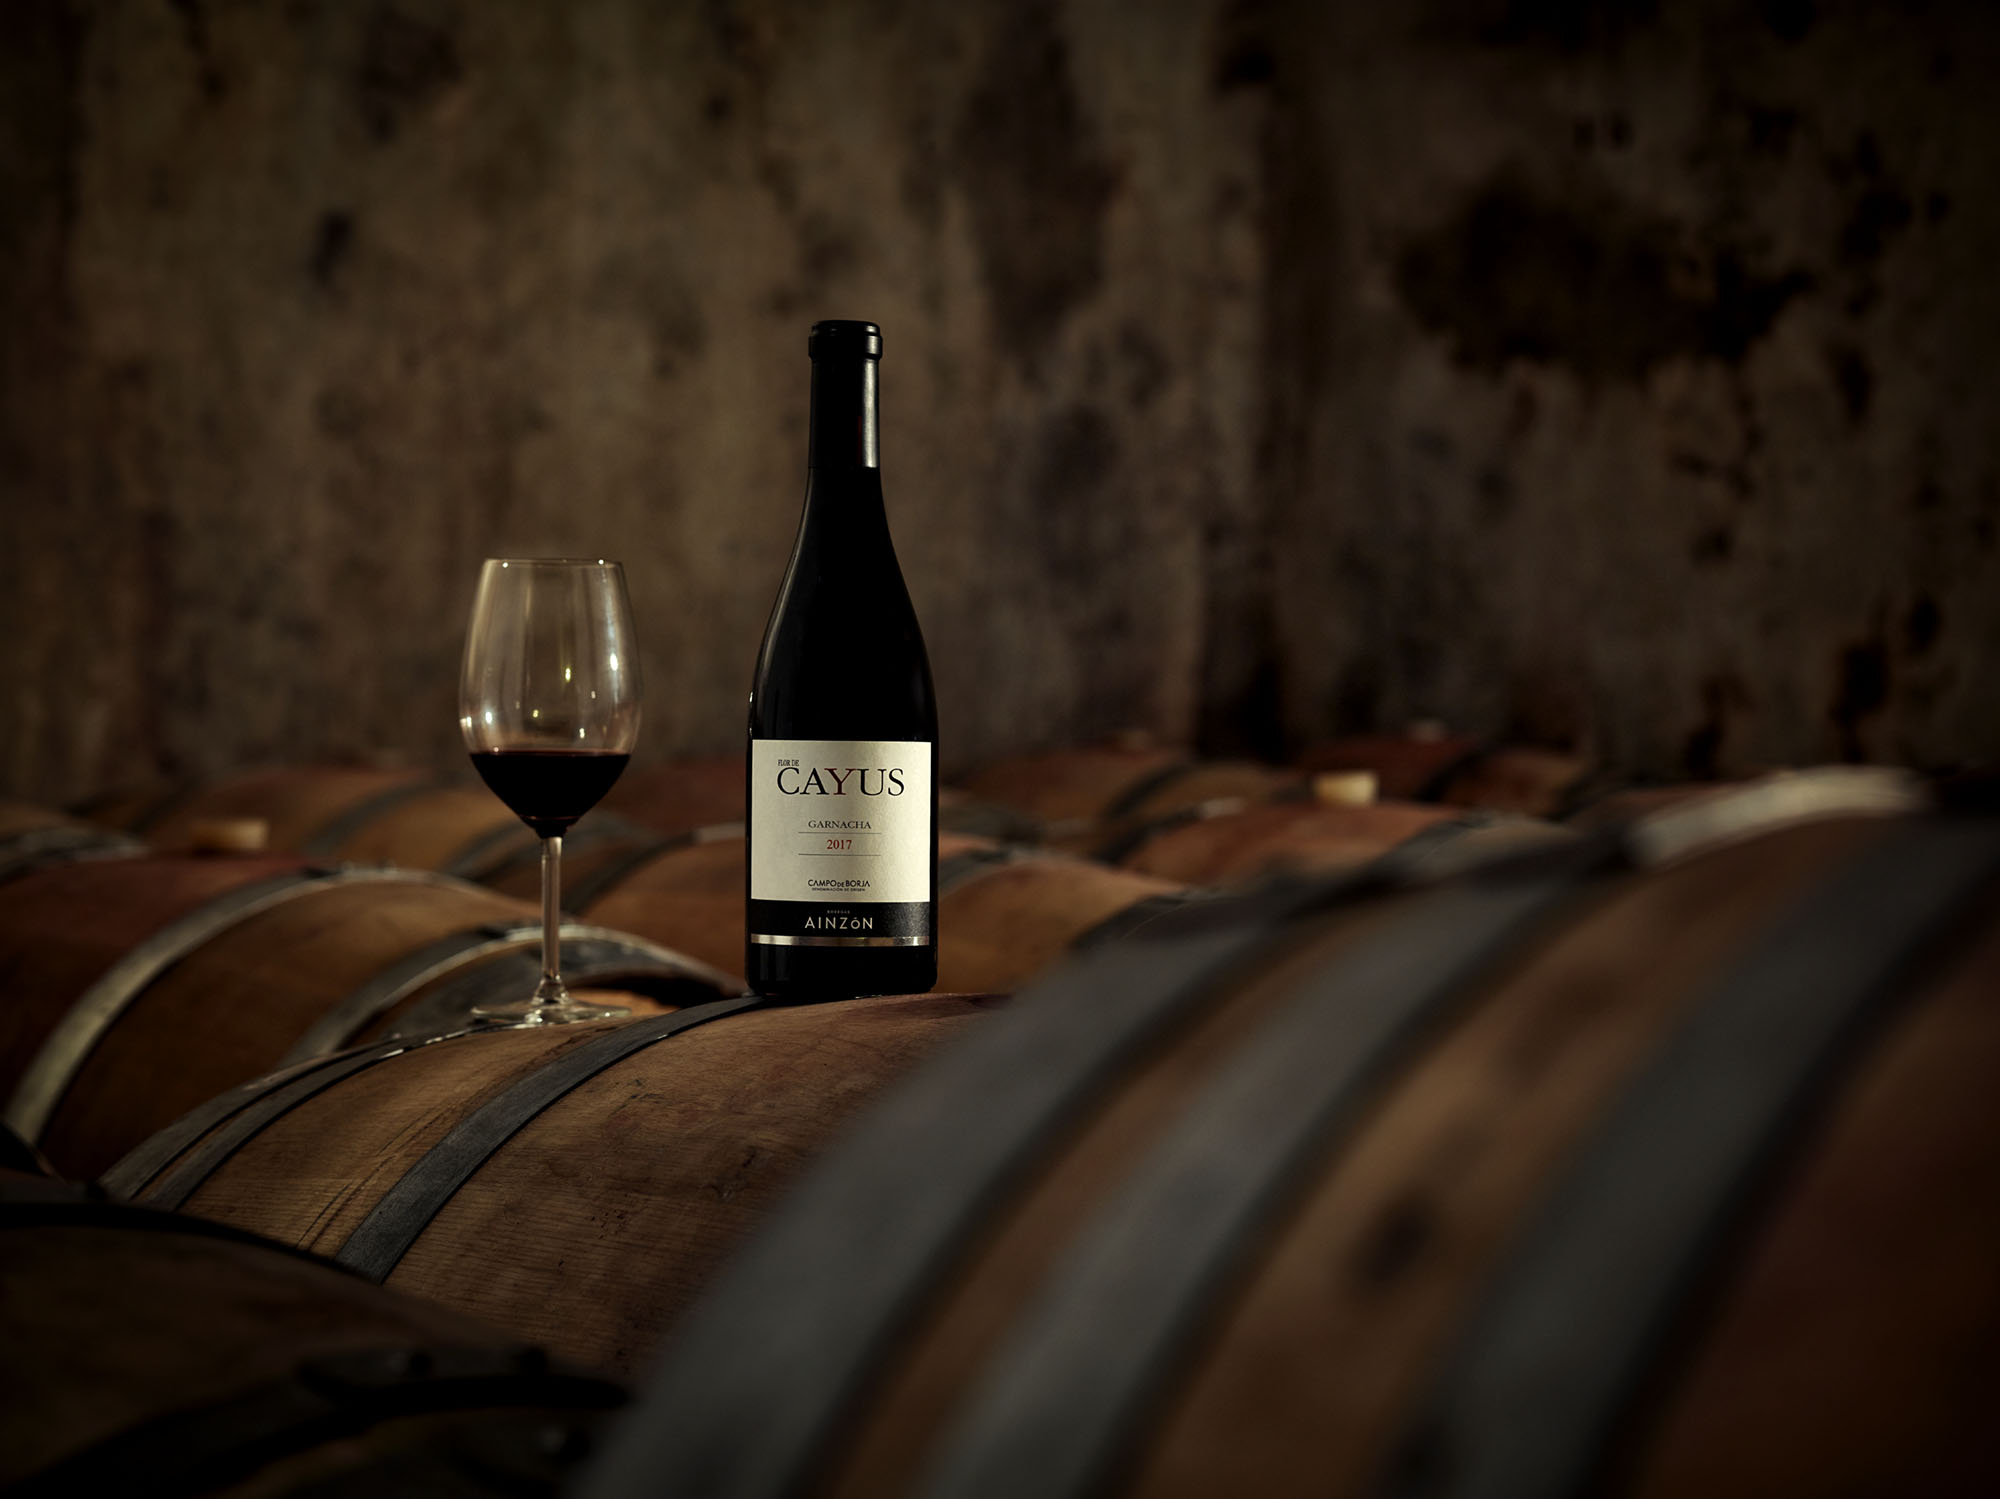 bodega, vino, wine,borja,comarca,zaragoza,rioja alavesa, tinto, blanco,paisaje,wenery,nikon,phaseone,profoto,botella,botle,